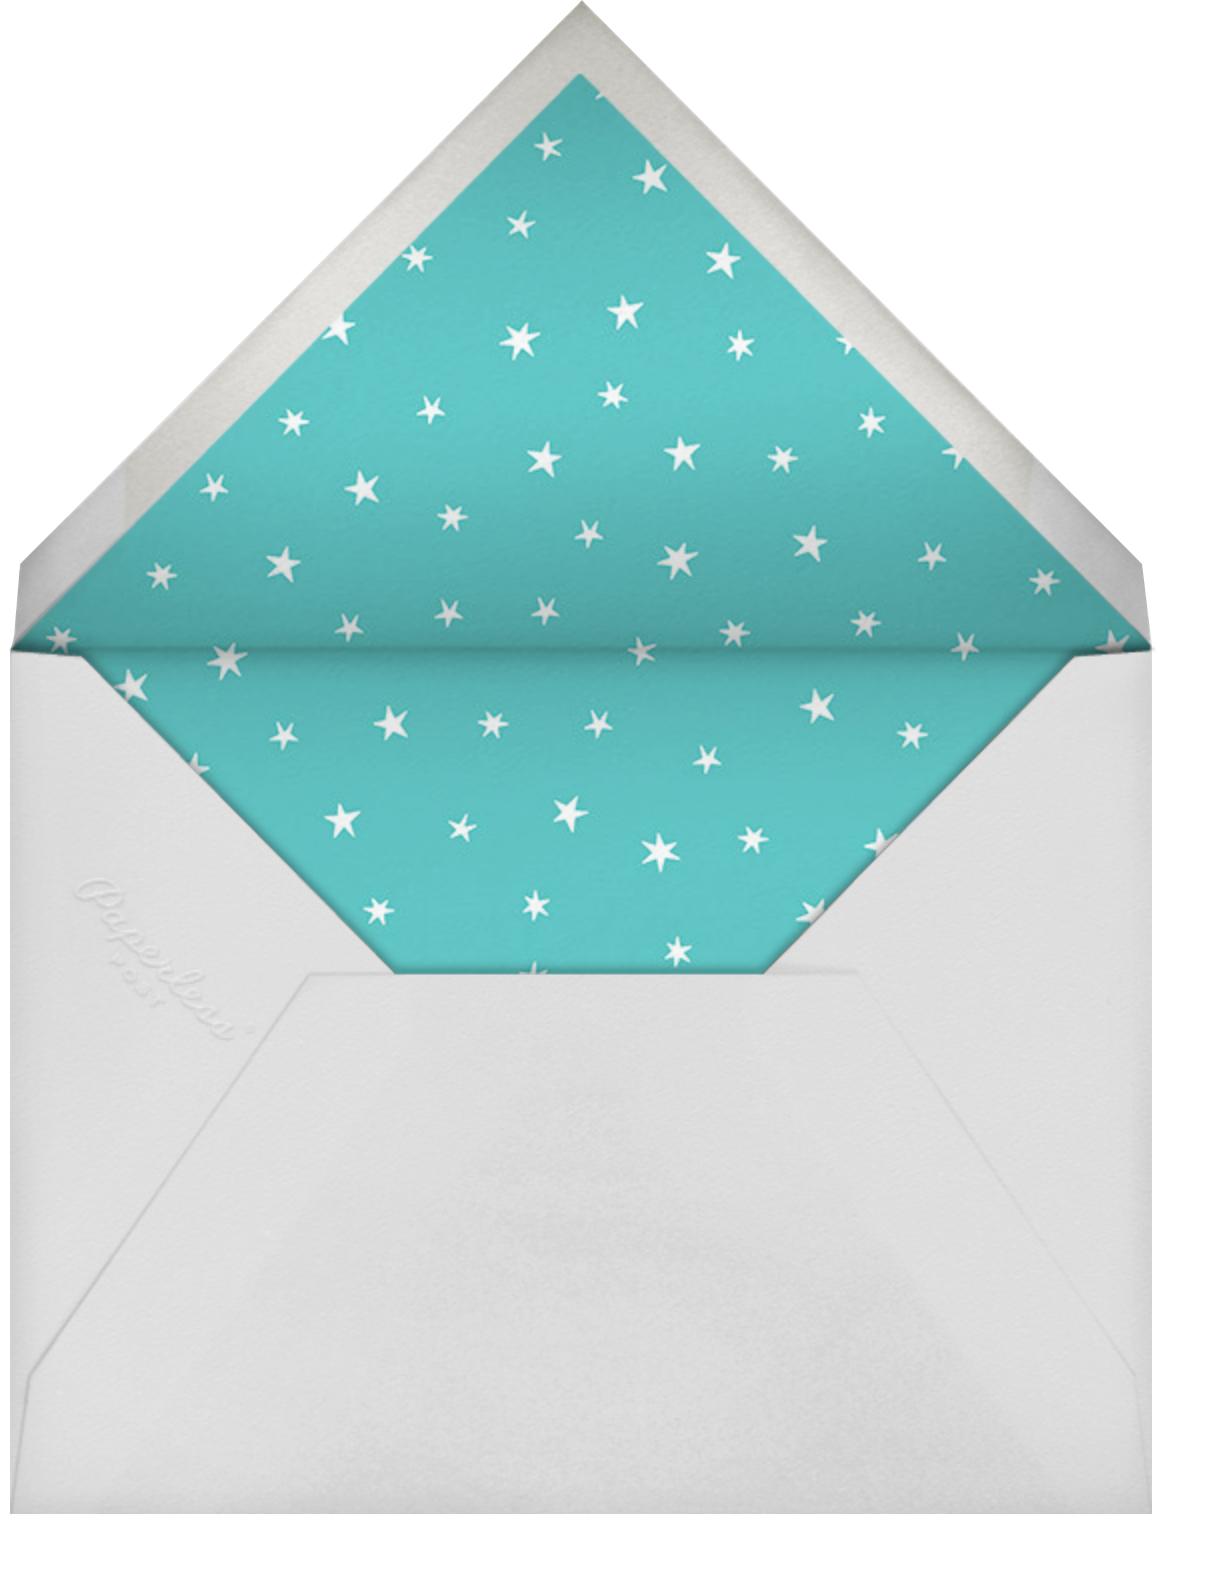 Nightly (Photo) - Celadon/Gold - Paperless Post - Envelope